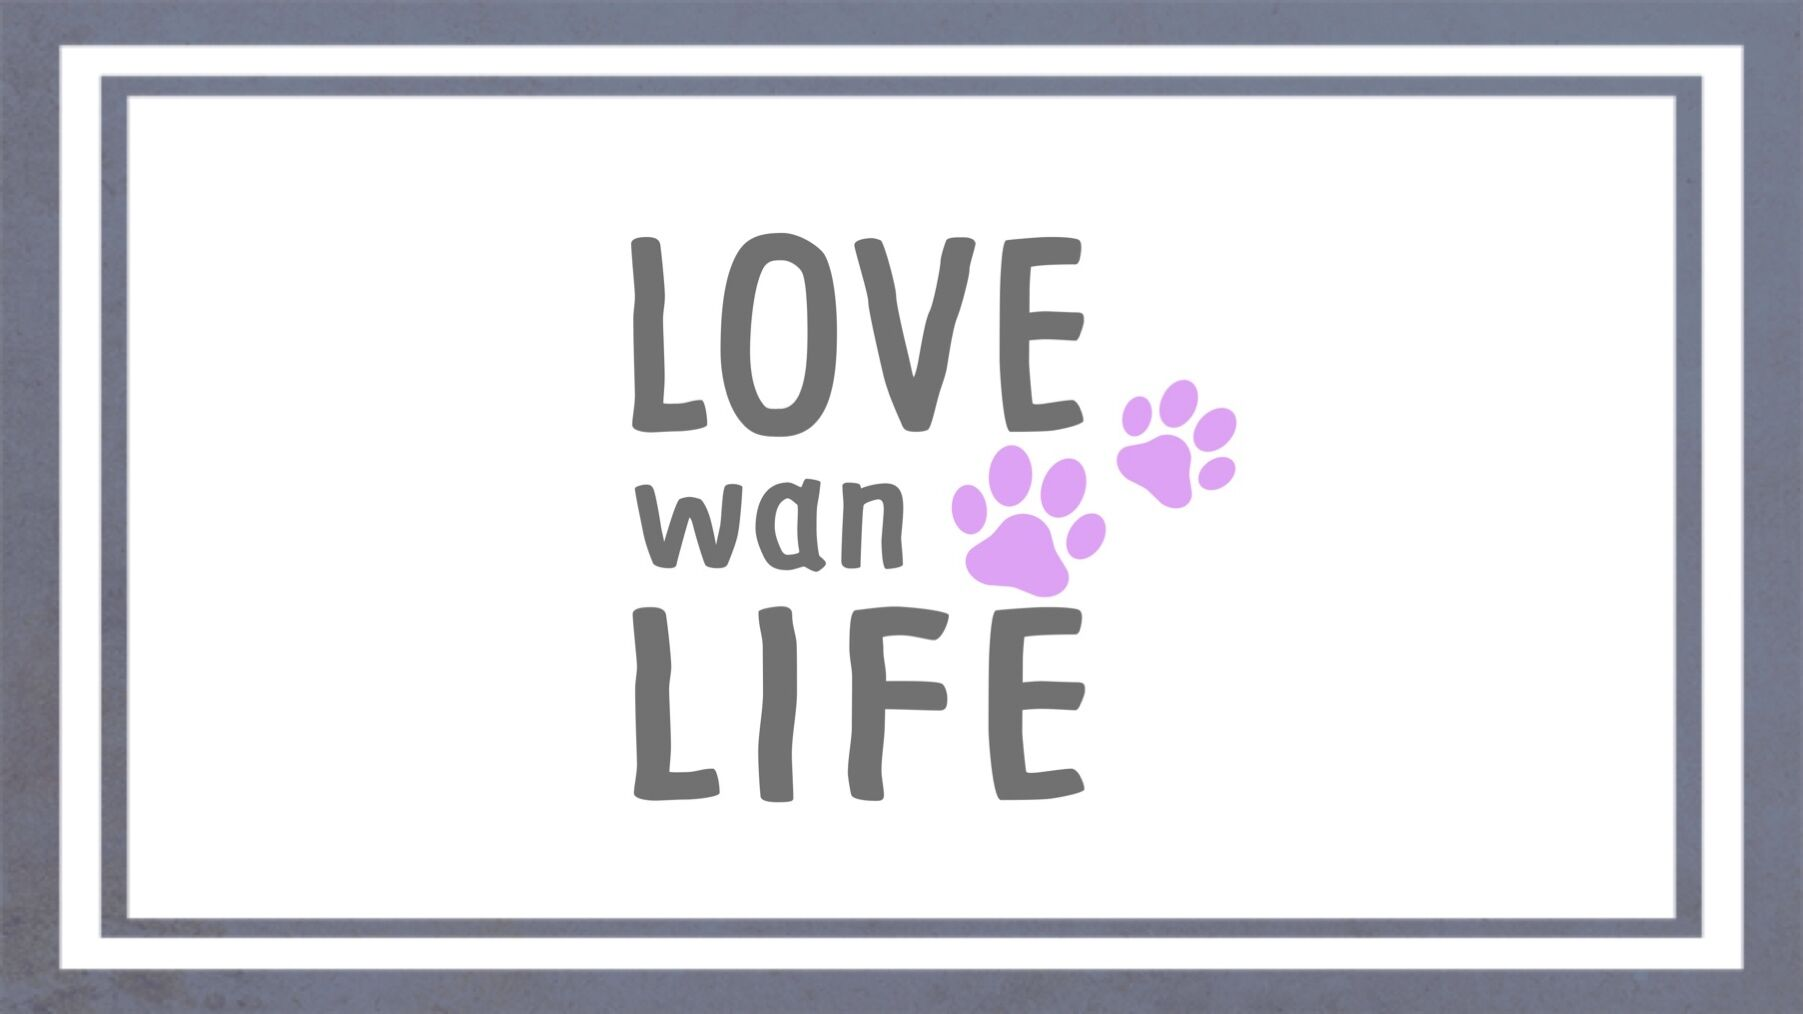 LOVEwanLIFE